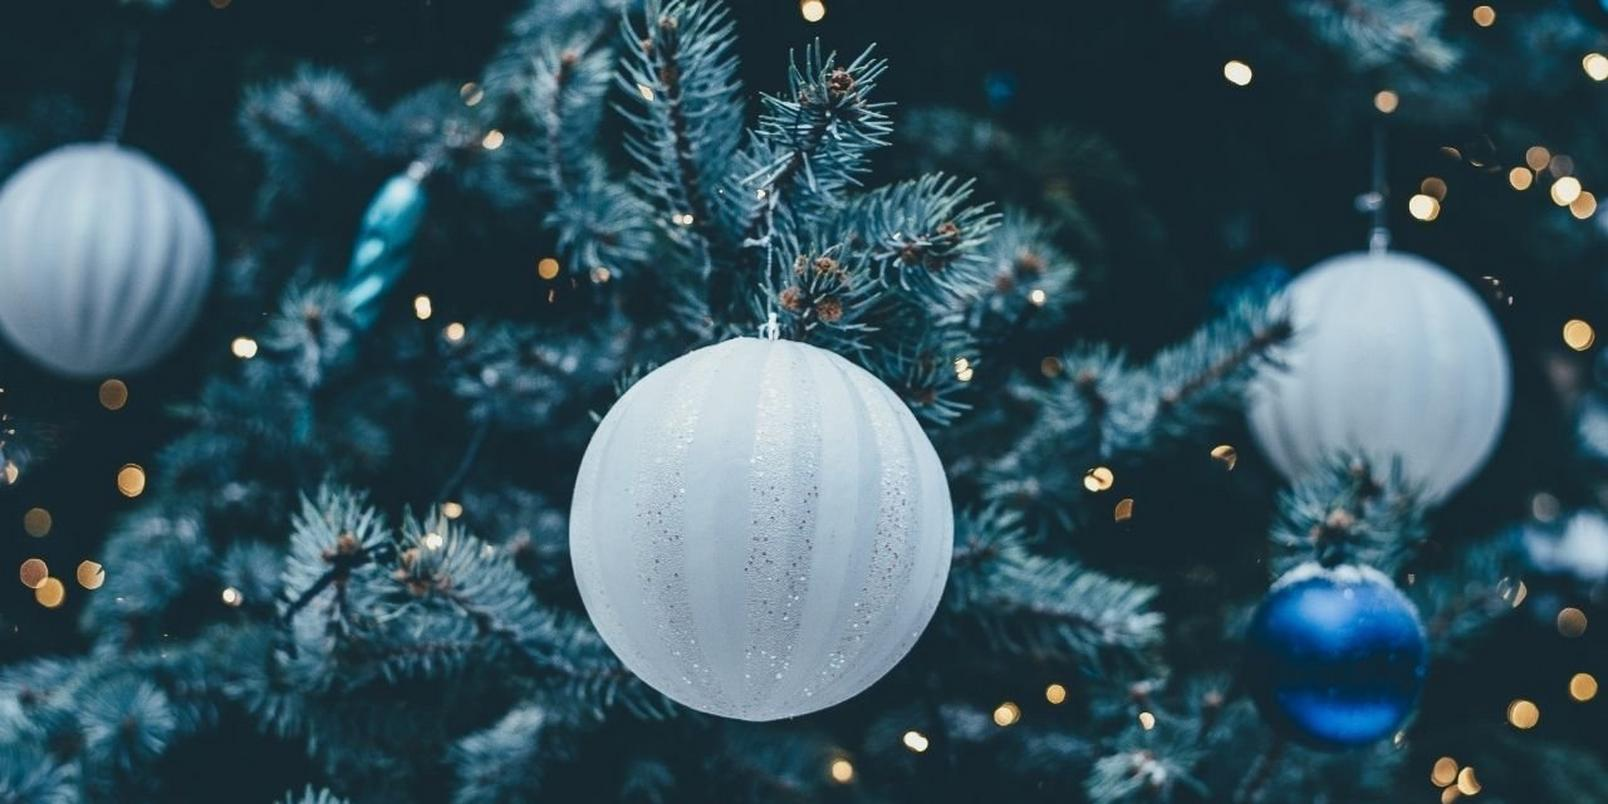 diy-christmas-tree-decorations-2